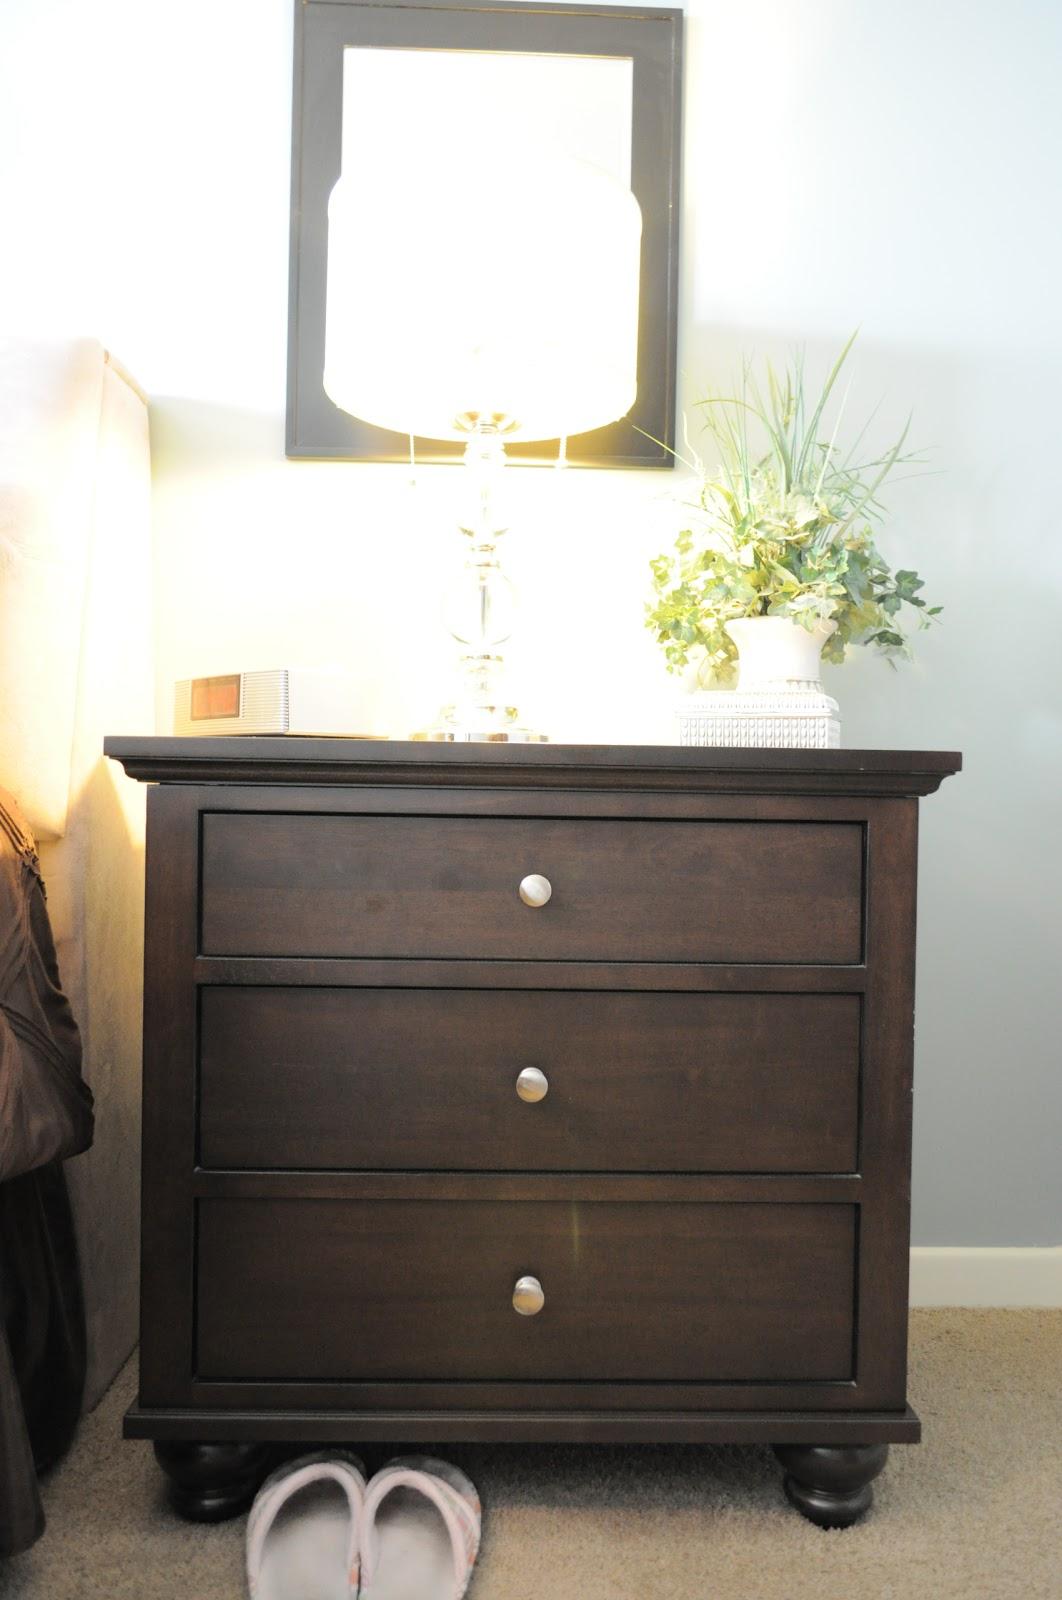 Nightstand Table: How I Organize My Bedroom: The Nightstands